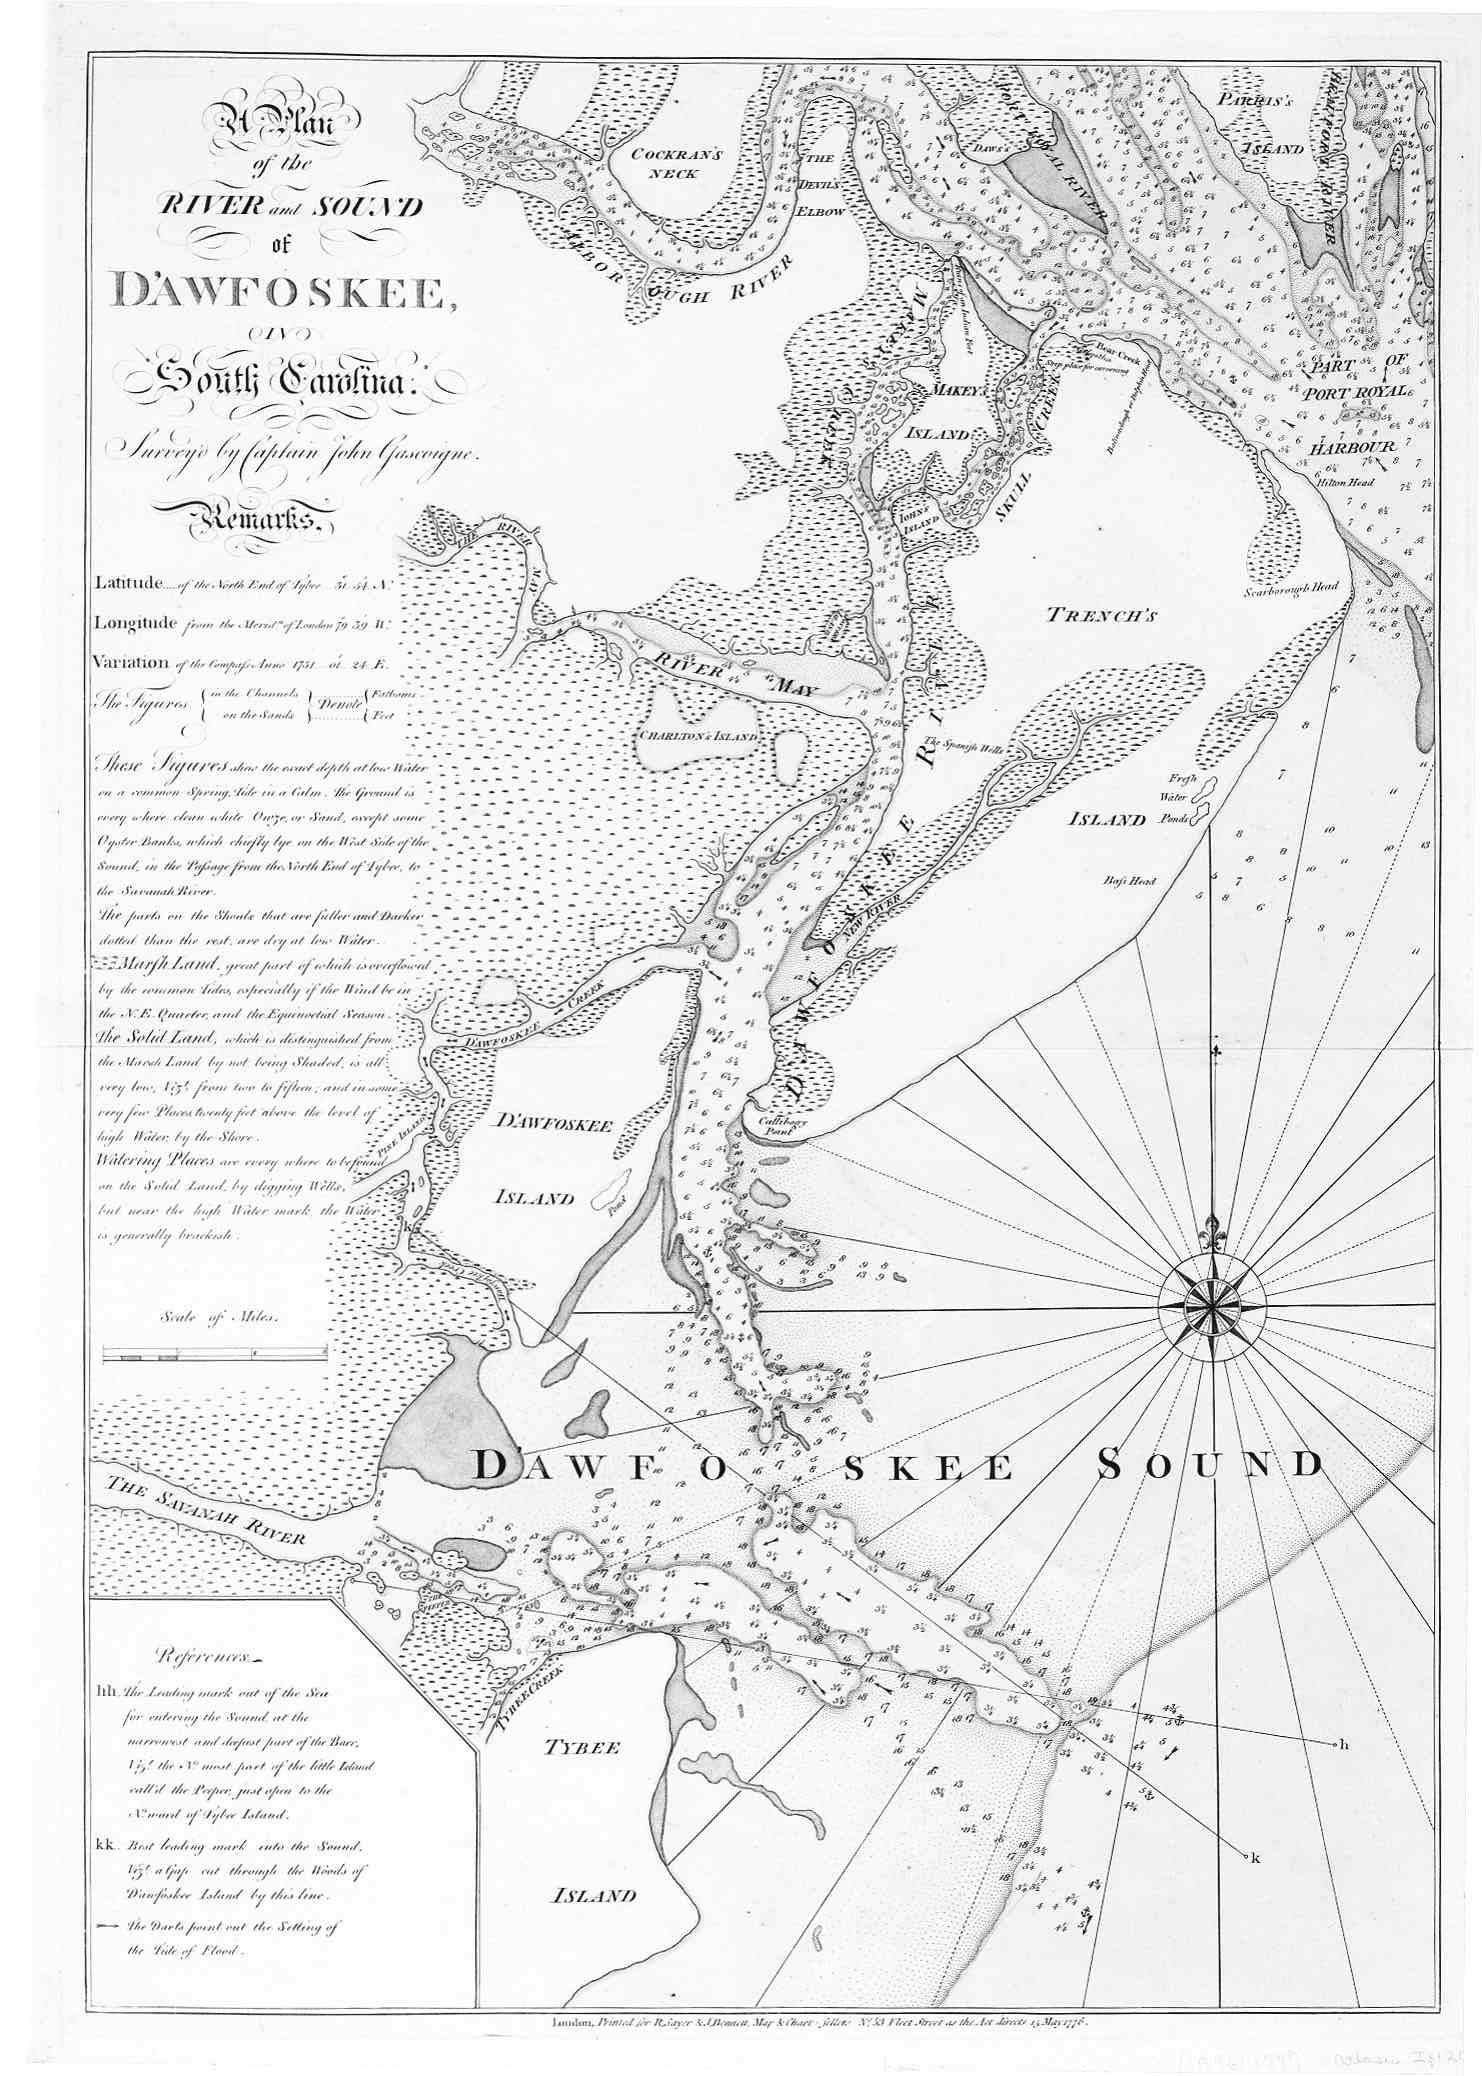 worksheet Revolutionary War Map Worksheet digital history 1776 a plan of the river and sound dawfoskee in south carolina